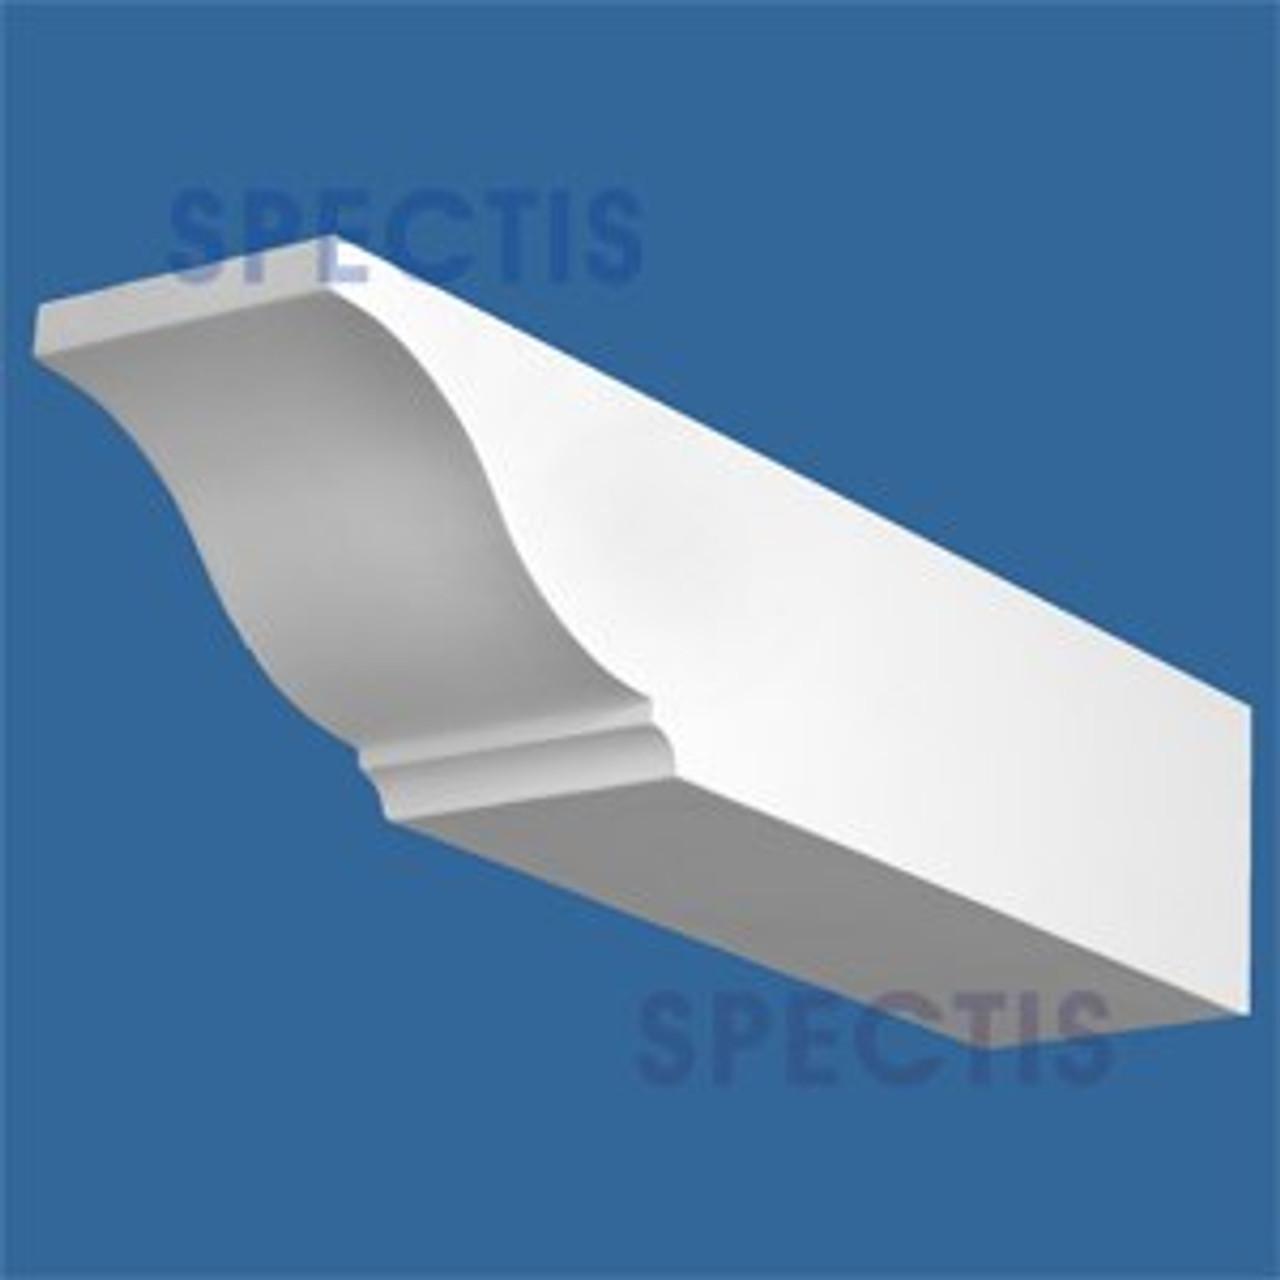 "BL2963-14 Corbel Block or Eave Bracket 4""W x 4""H x 14"" P"